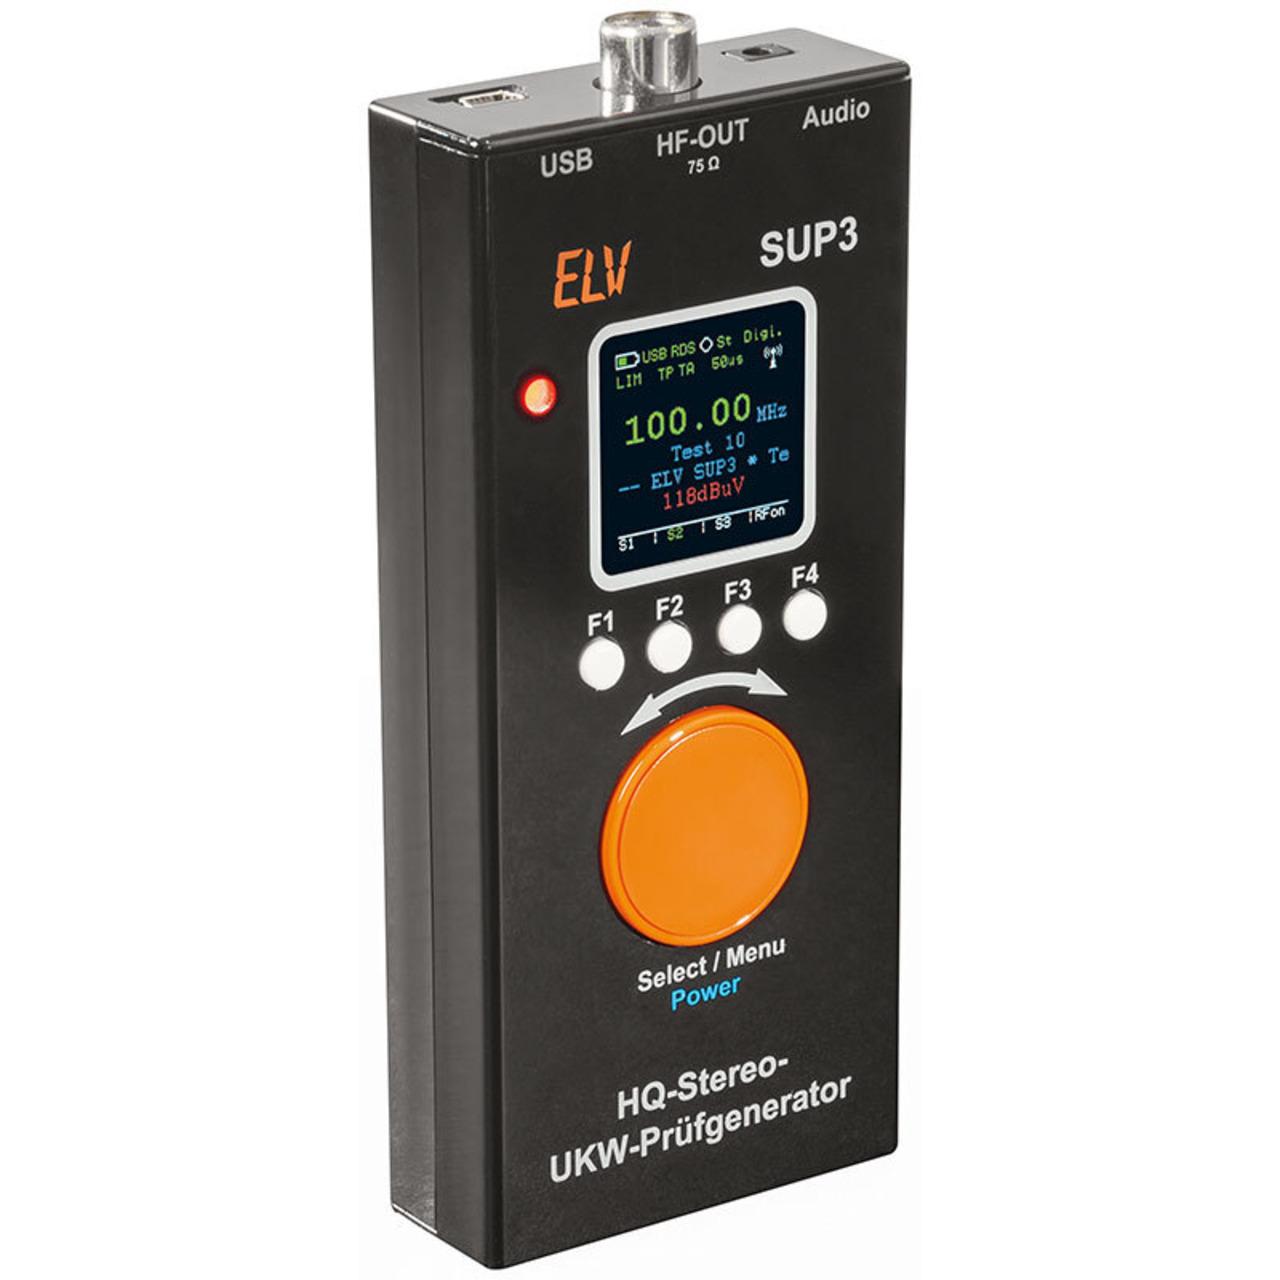 ELV Komplettbausatz HQ-Stereo-UKW-Prüfgenerator mit OLED-Display SUP3